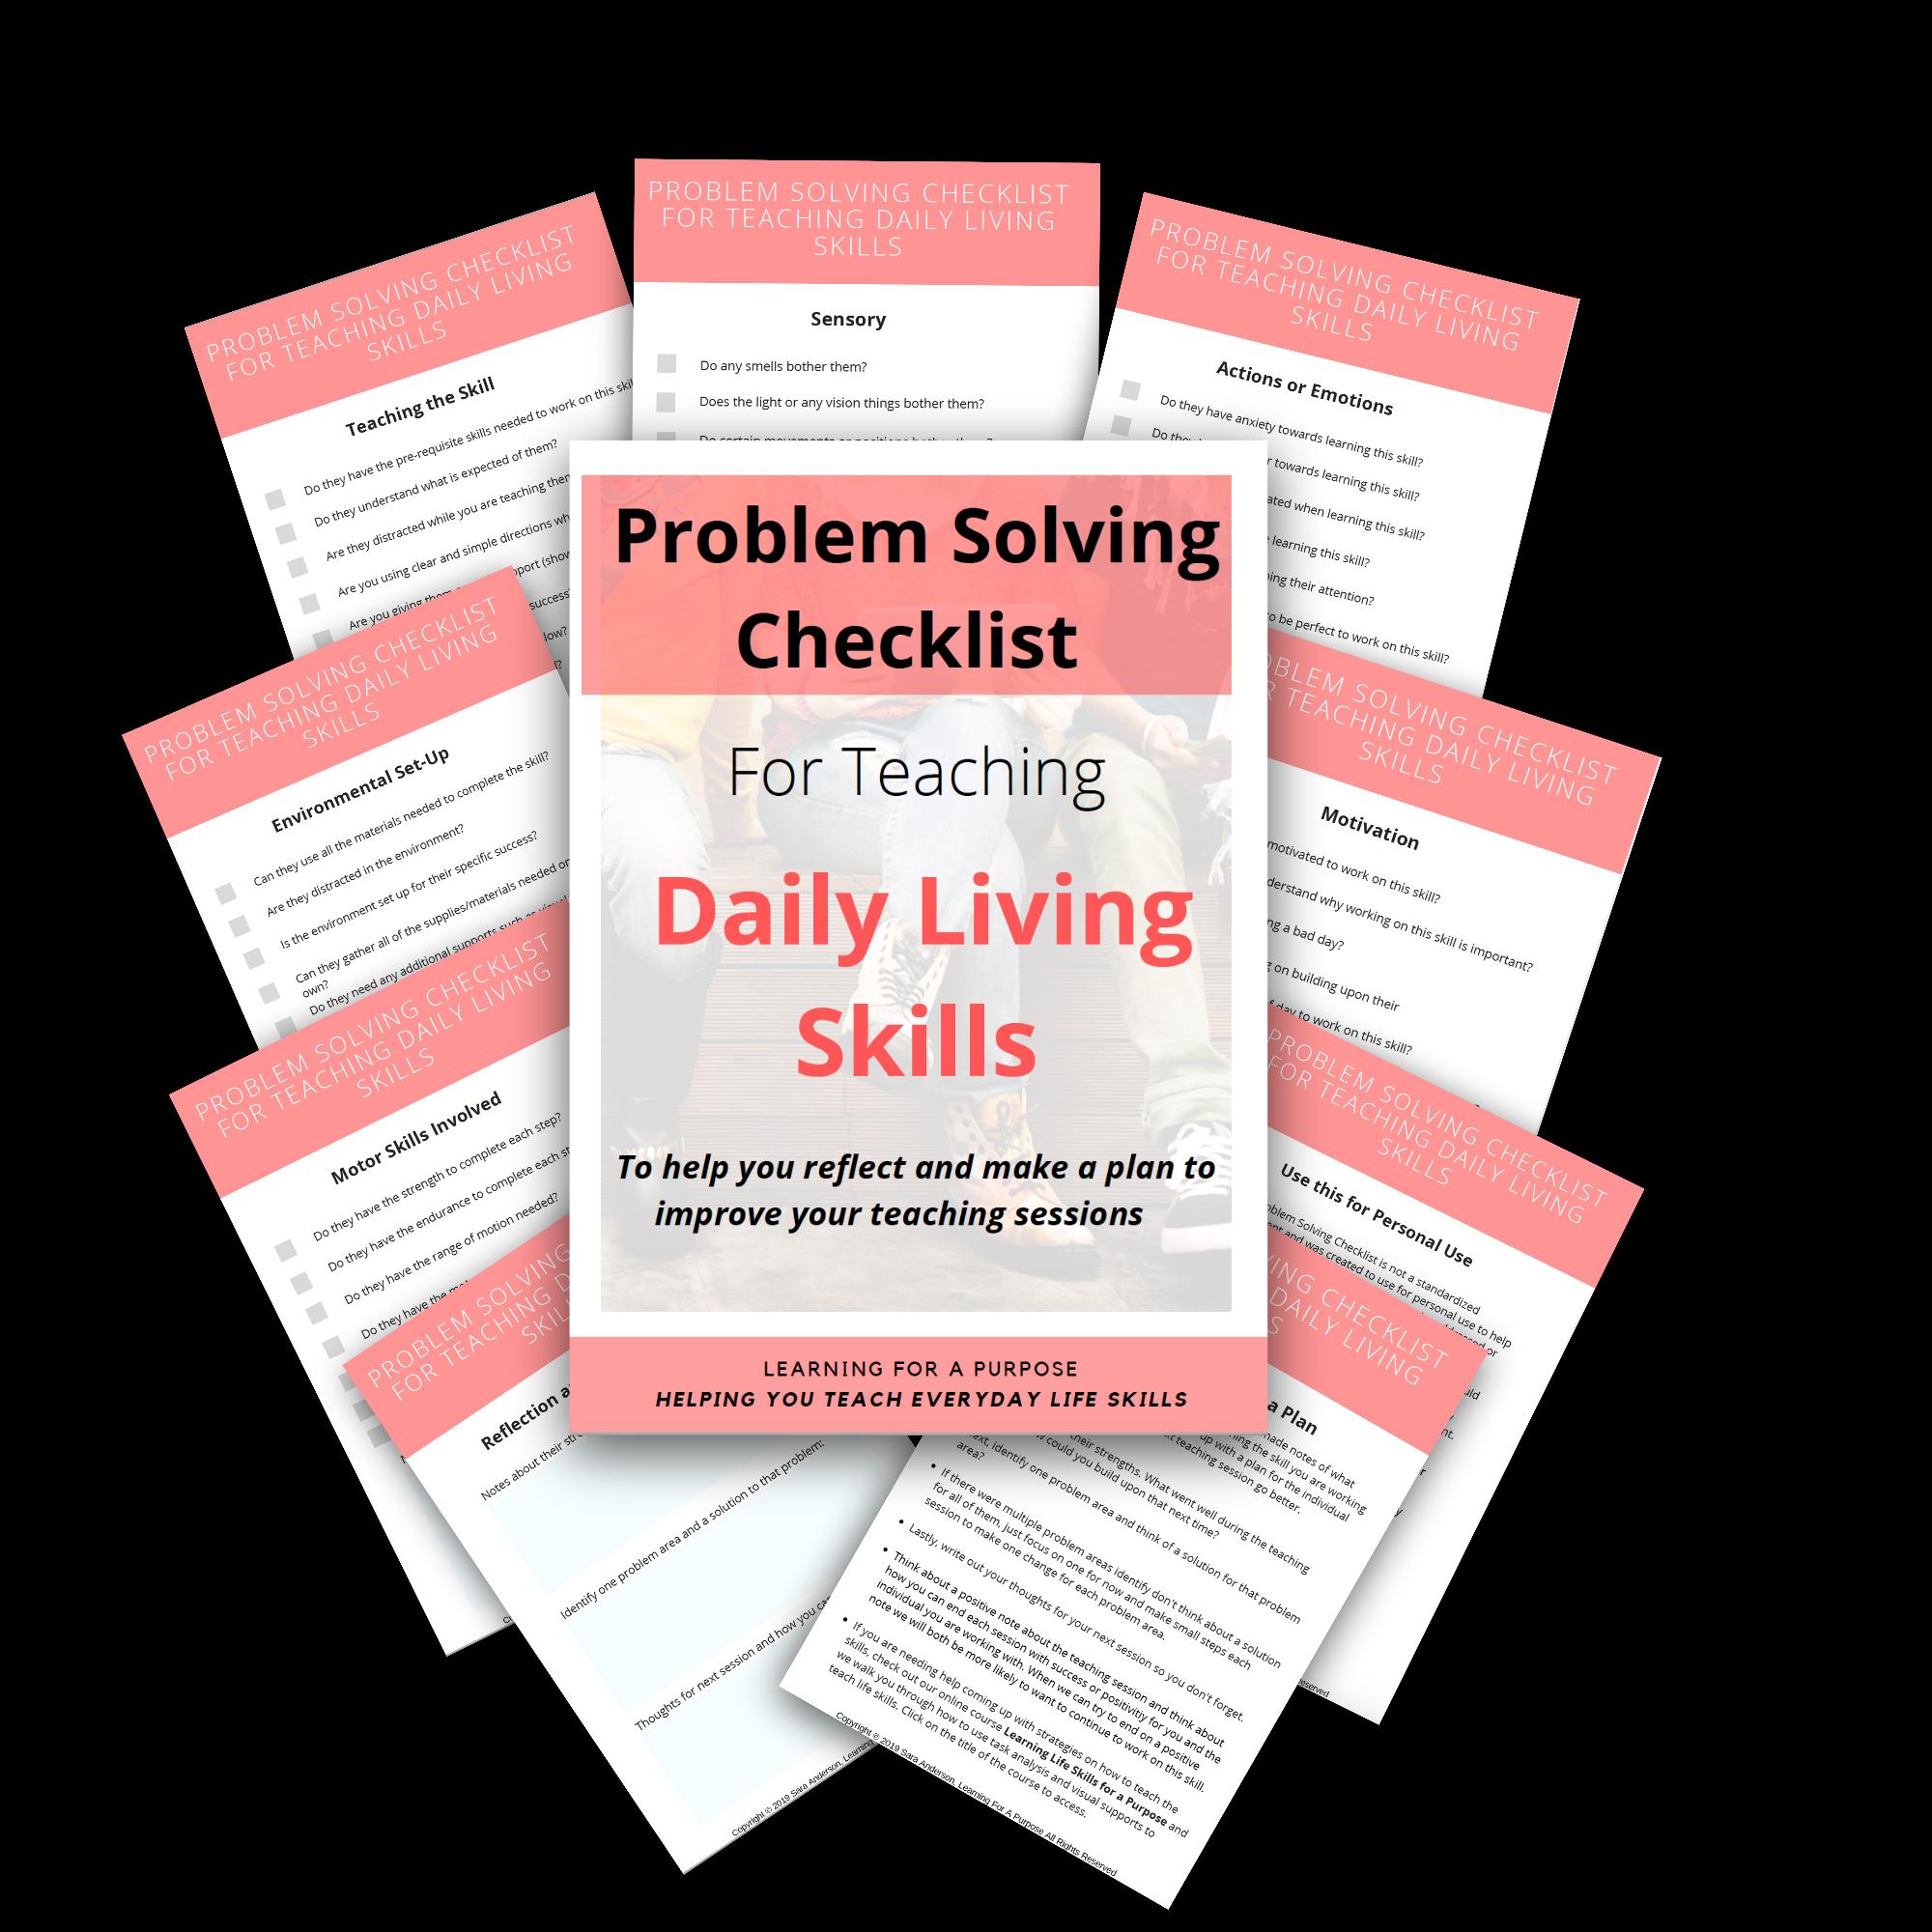 Problem Solving Checklist For Teaching Daily Living Skills